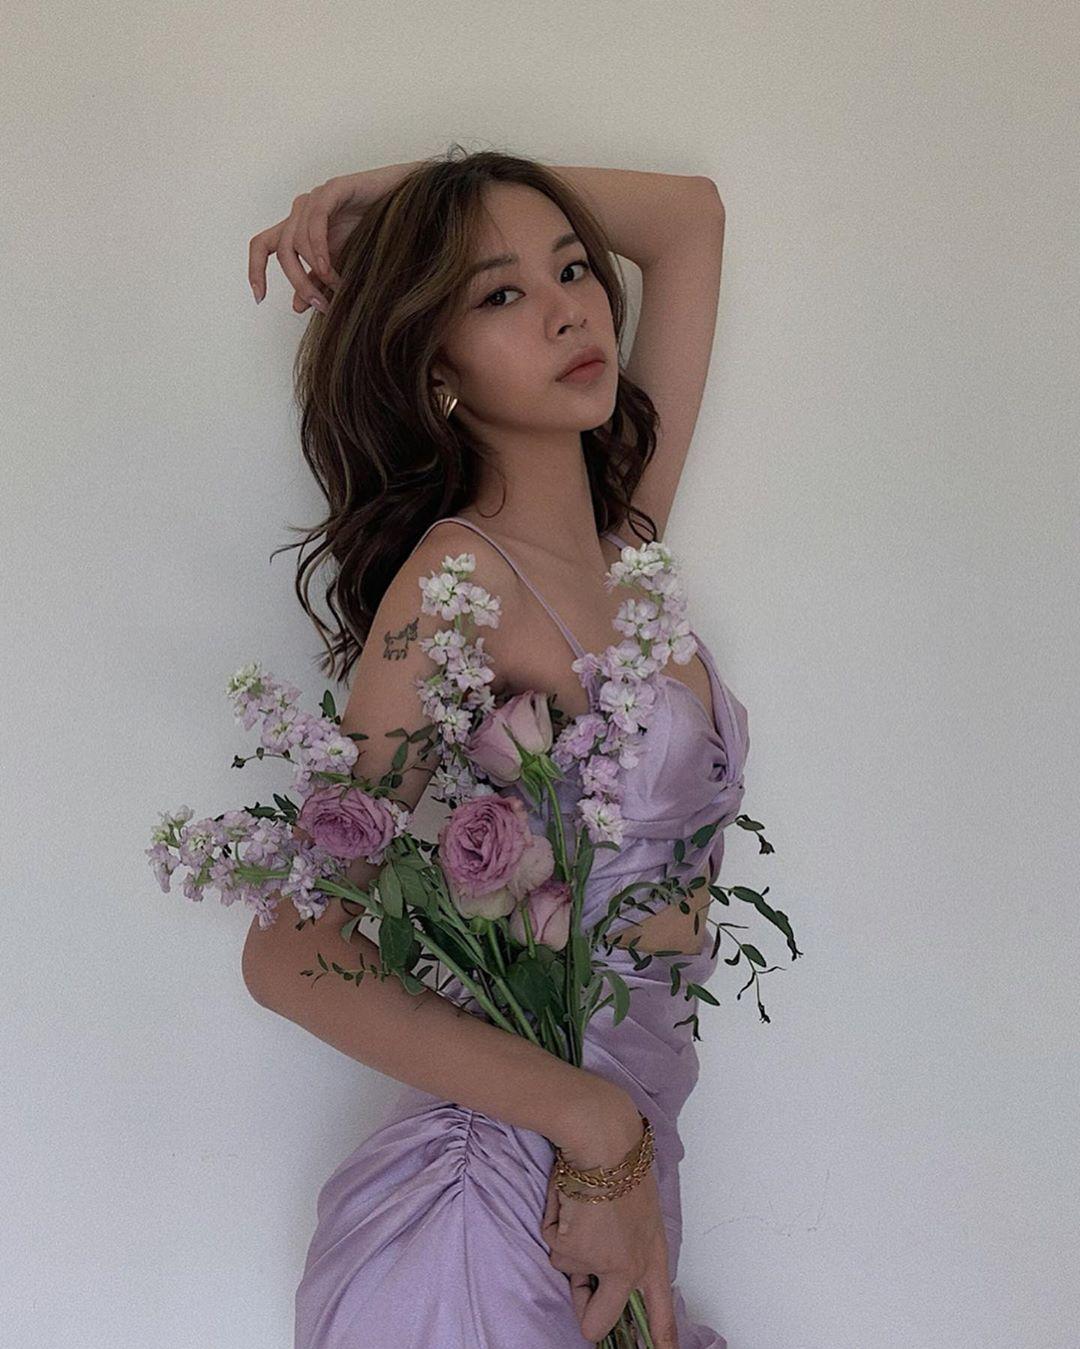 Phí Phương Anh mặc slip dress lụa tím lilac